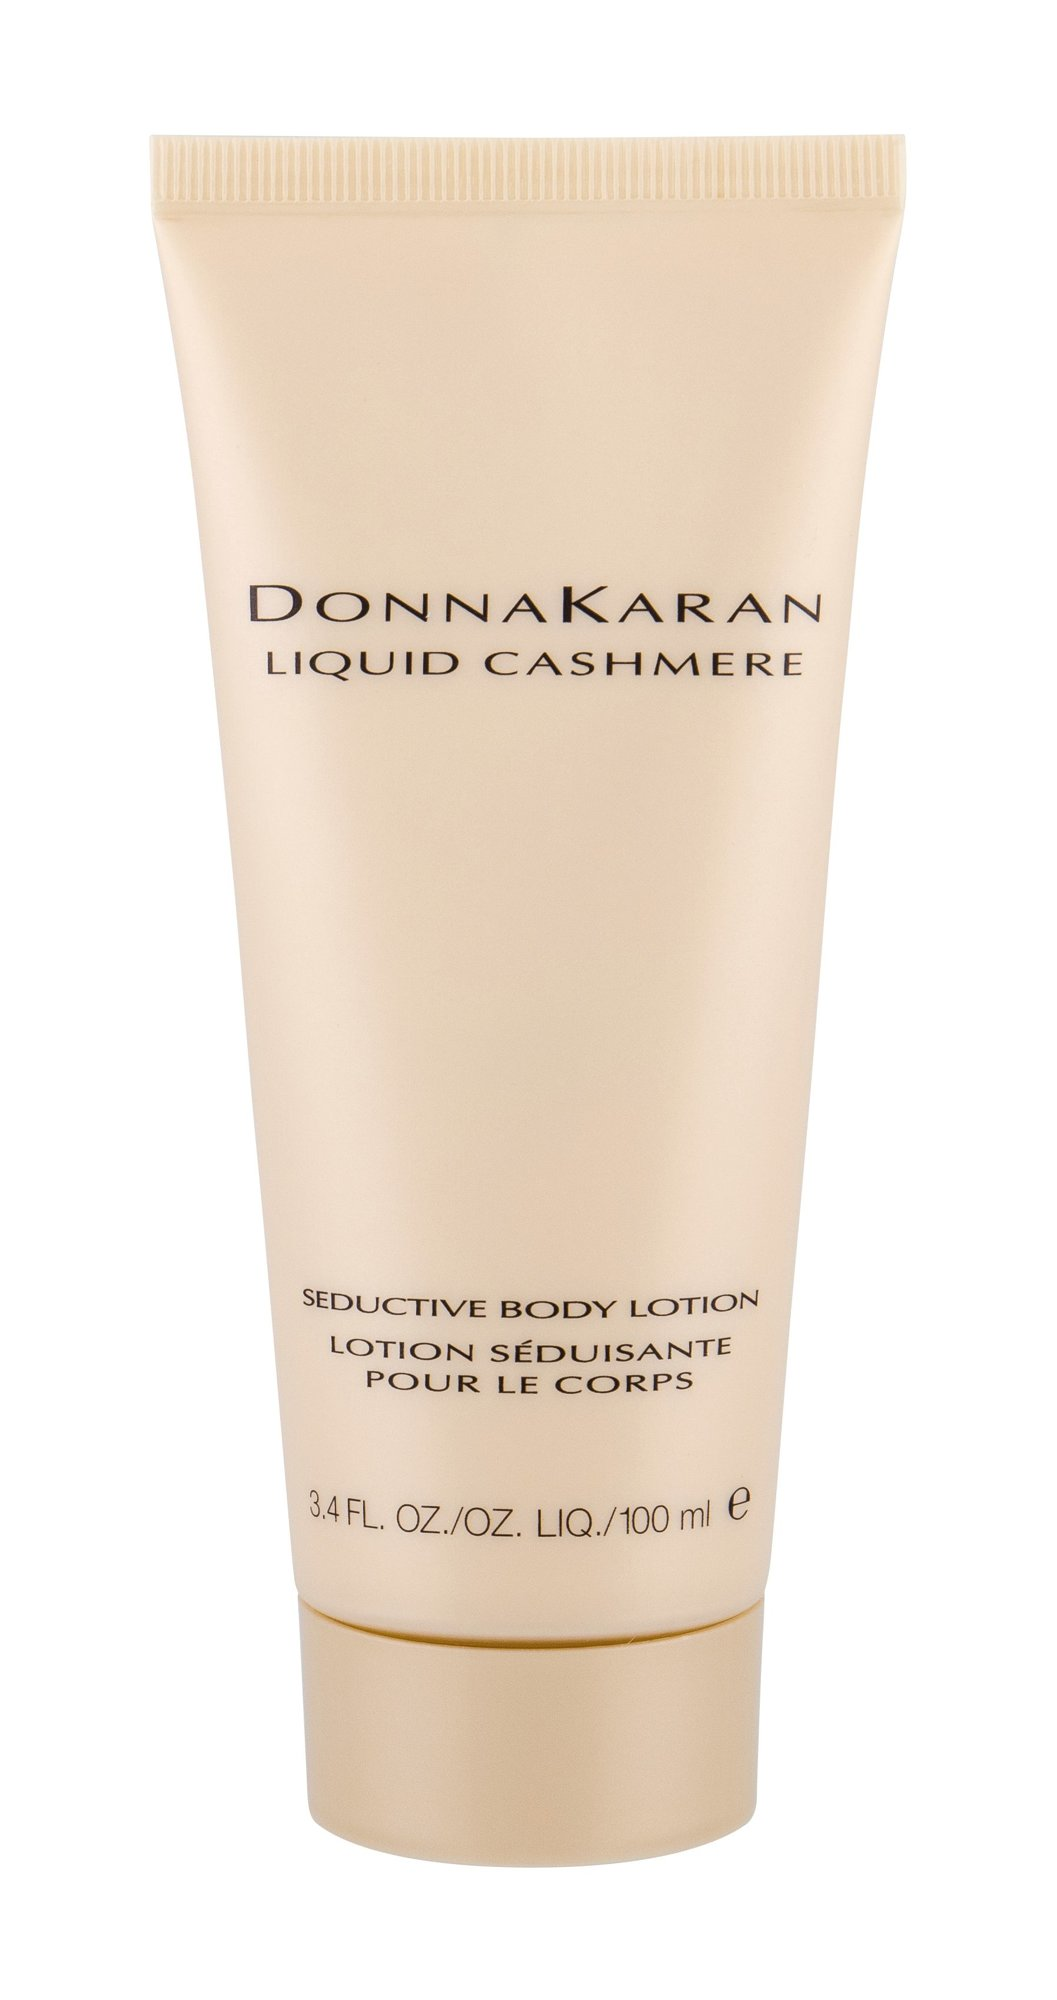 DKNY Liquid Cashmere White Body Lotion 100ml